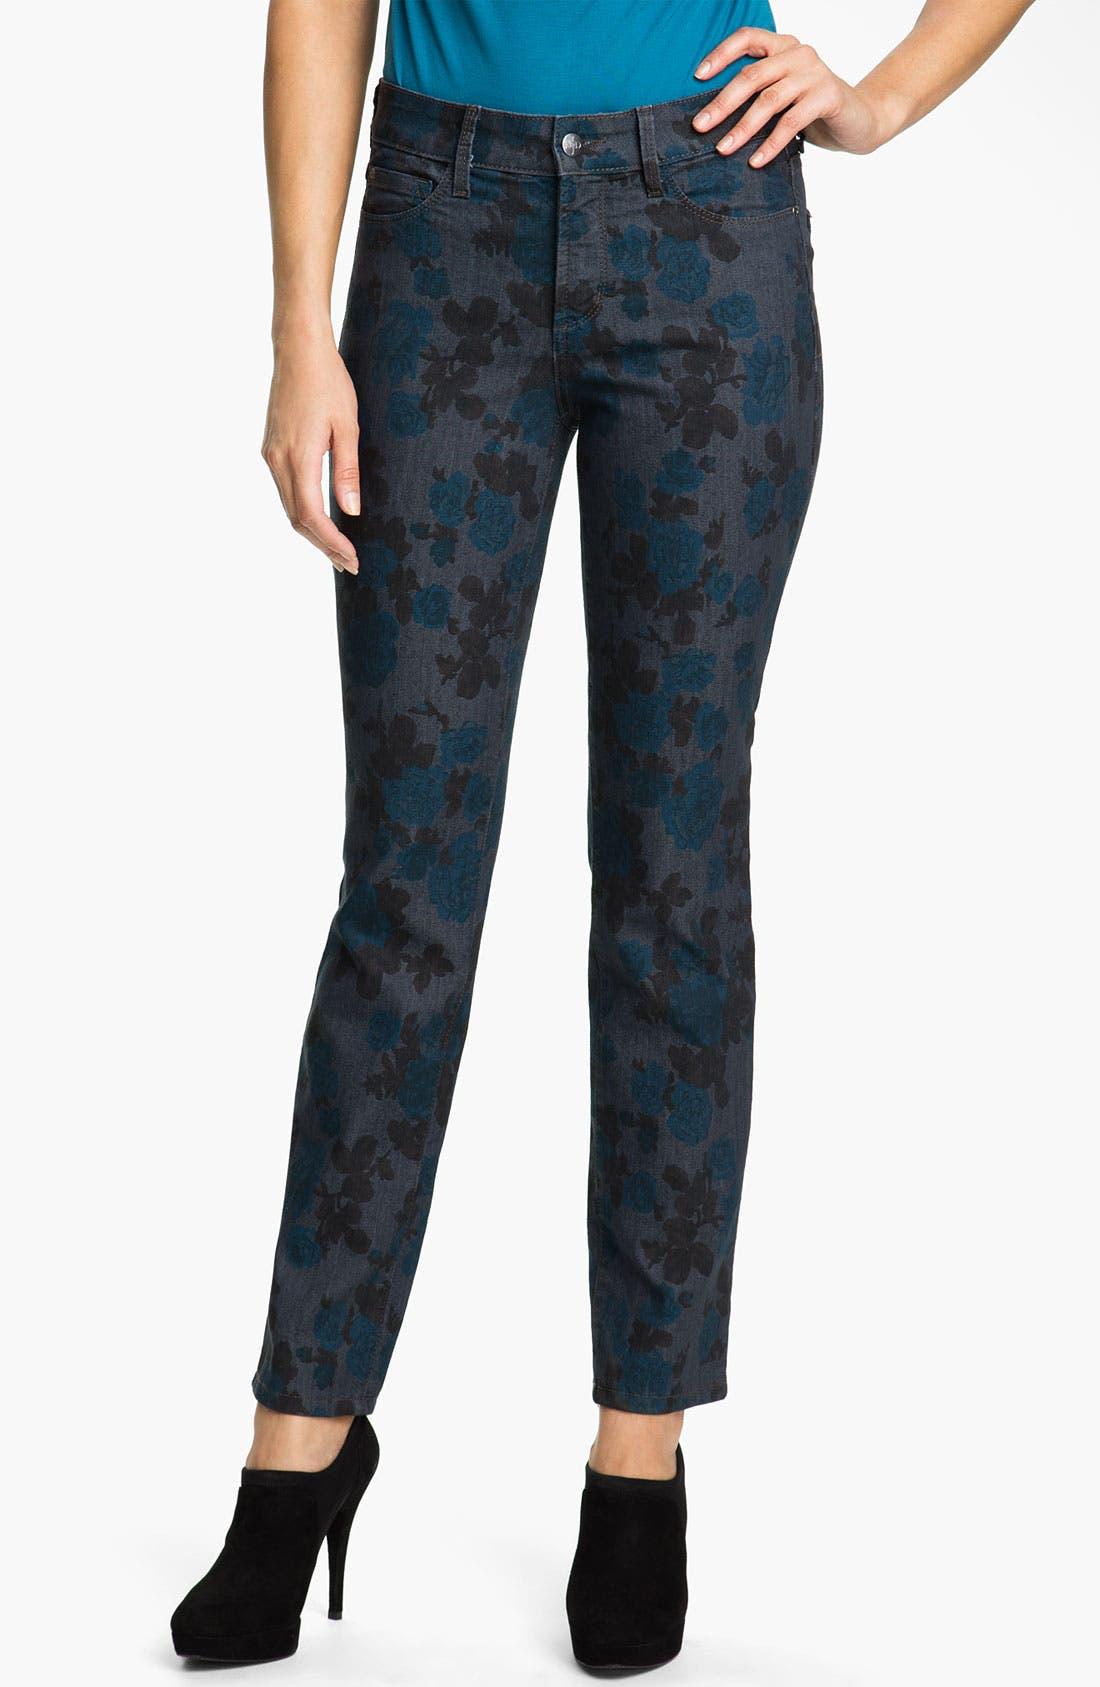 Main Image - NYDJ 'Sheri - Wild Rose' Print Skinny Twill Jeans